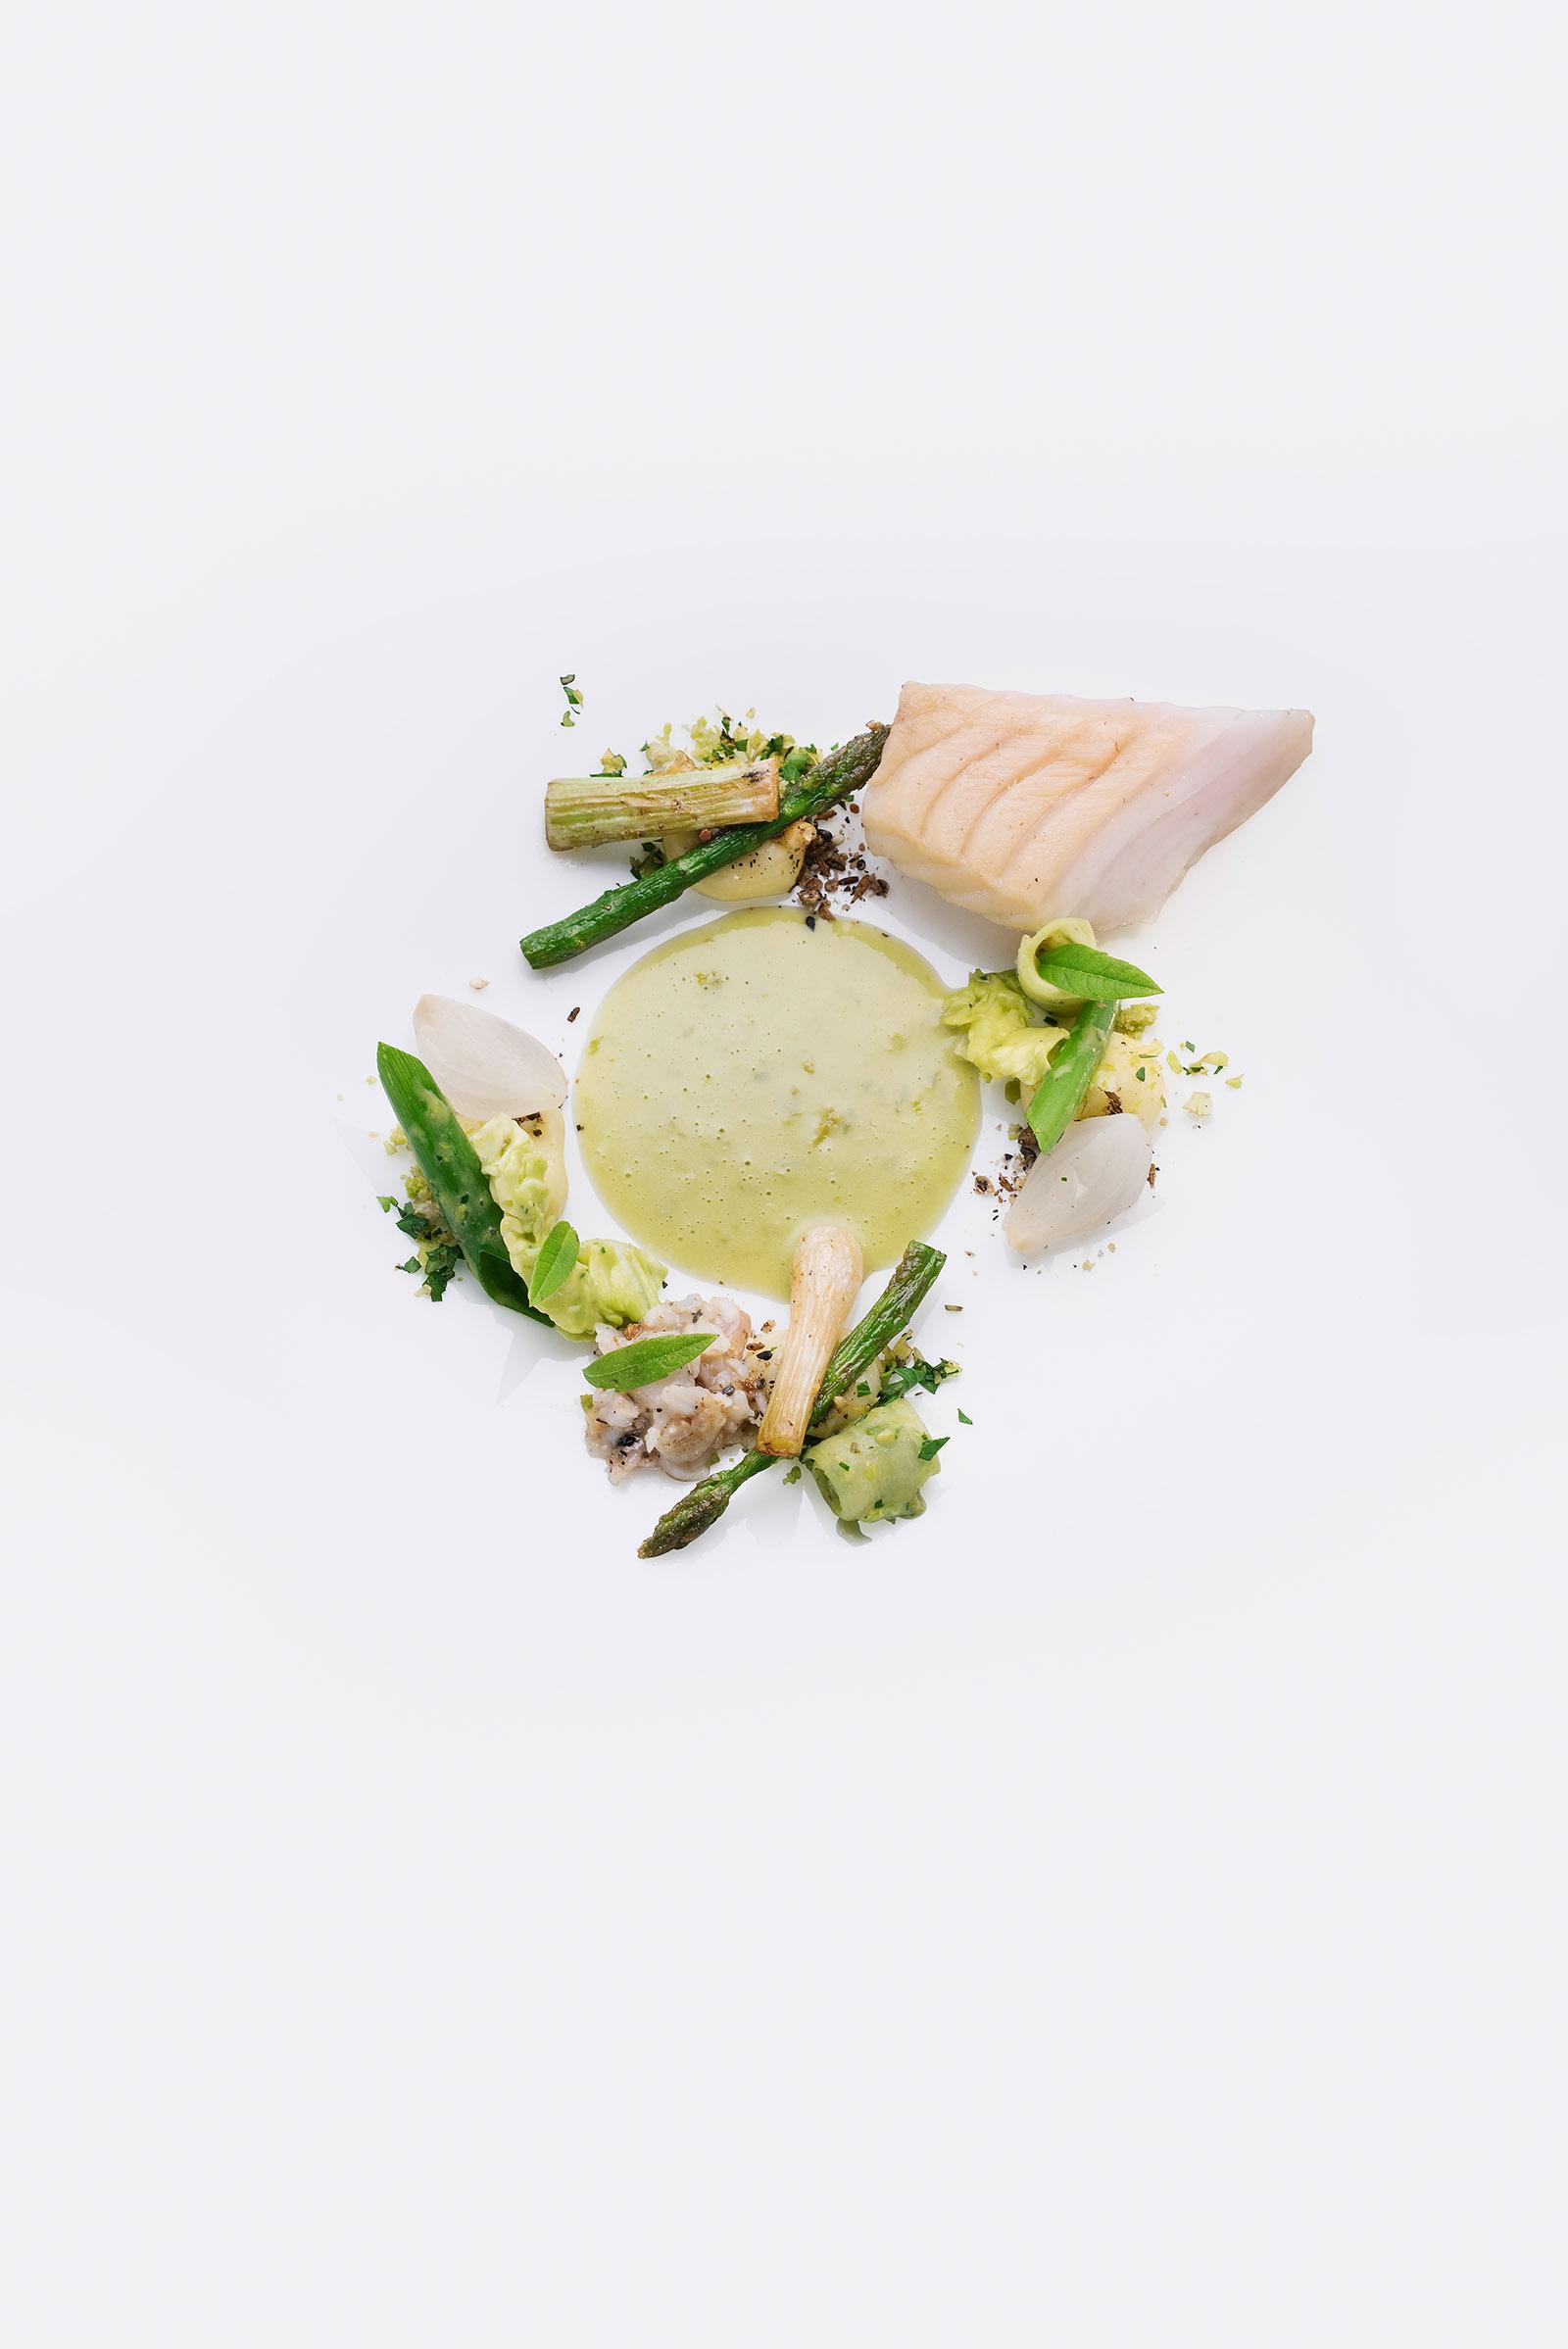 Foodfotografie Werbefotografie fotostudio Oberfranken THOMAS KELLERMANN GRÜNES GEMÜSE MIT ZANDER